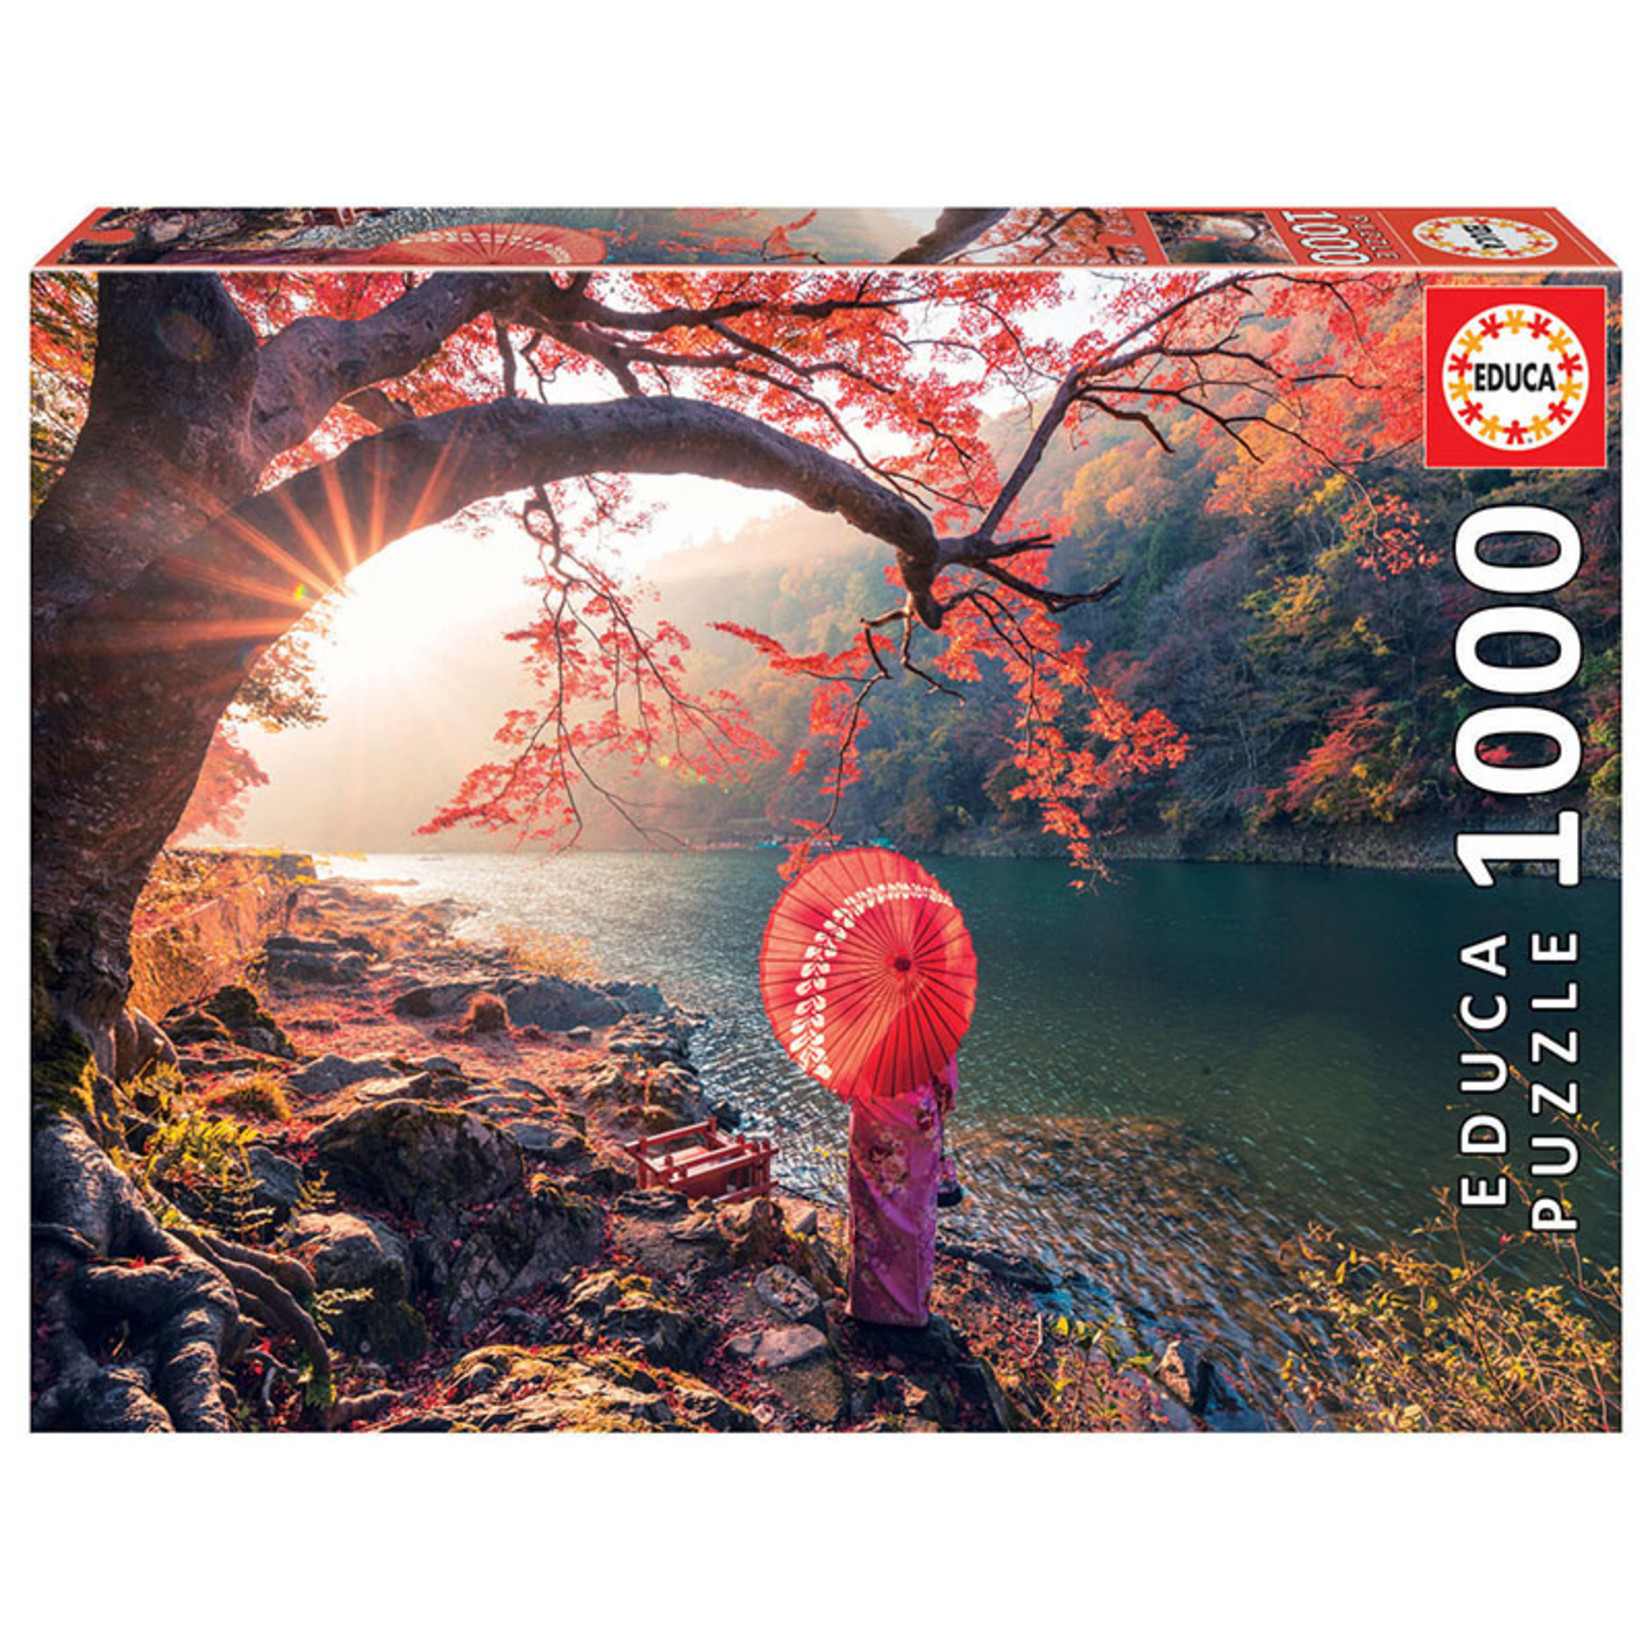 Educa Puzzles Sunrise in Katsura River Japan 1000pc